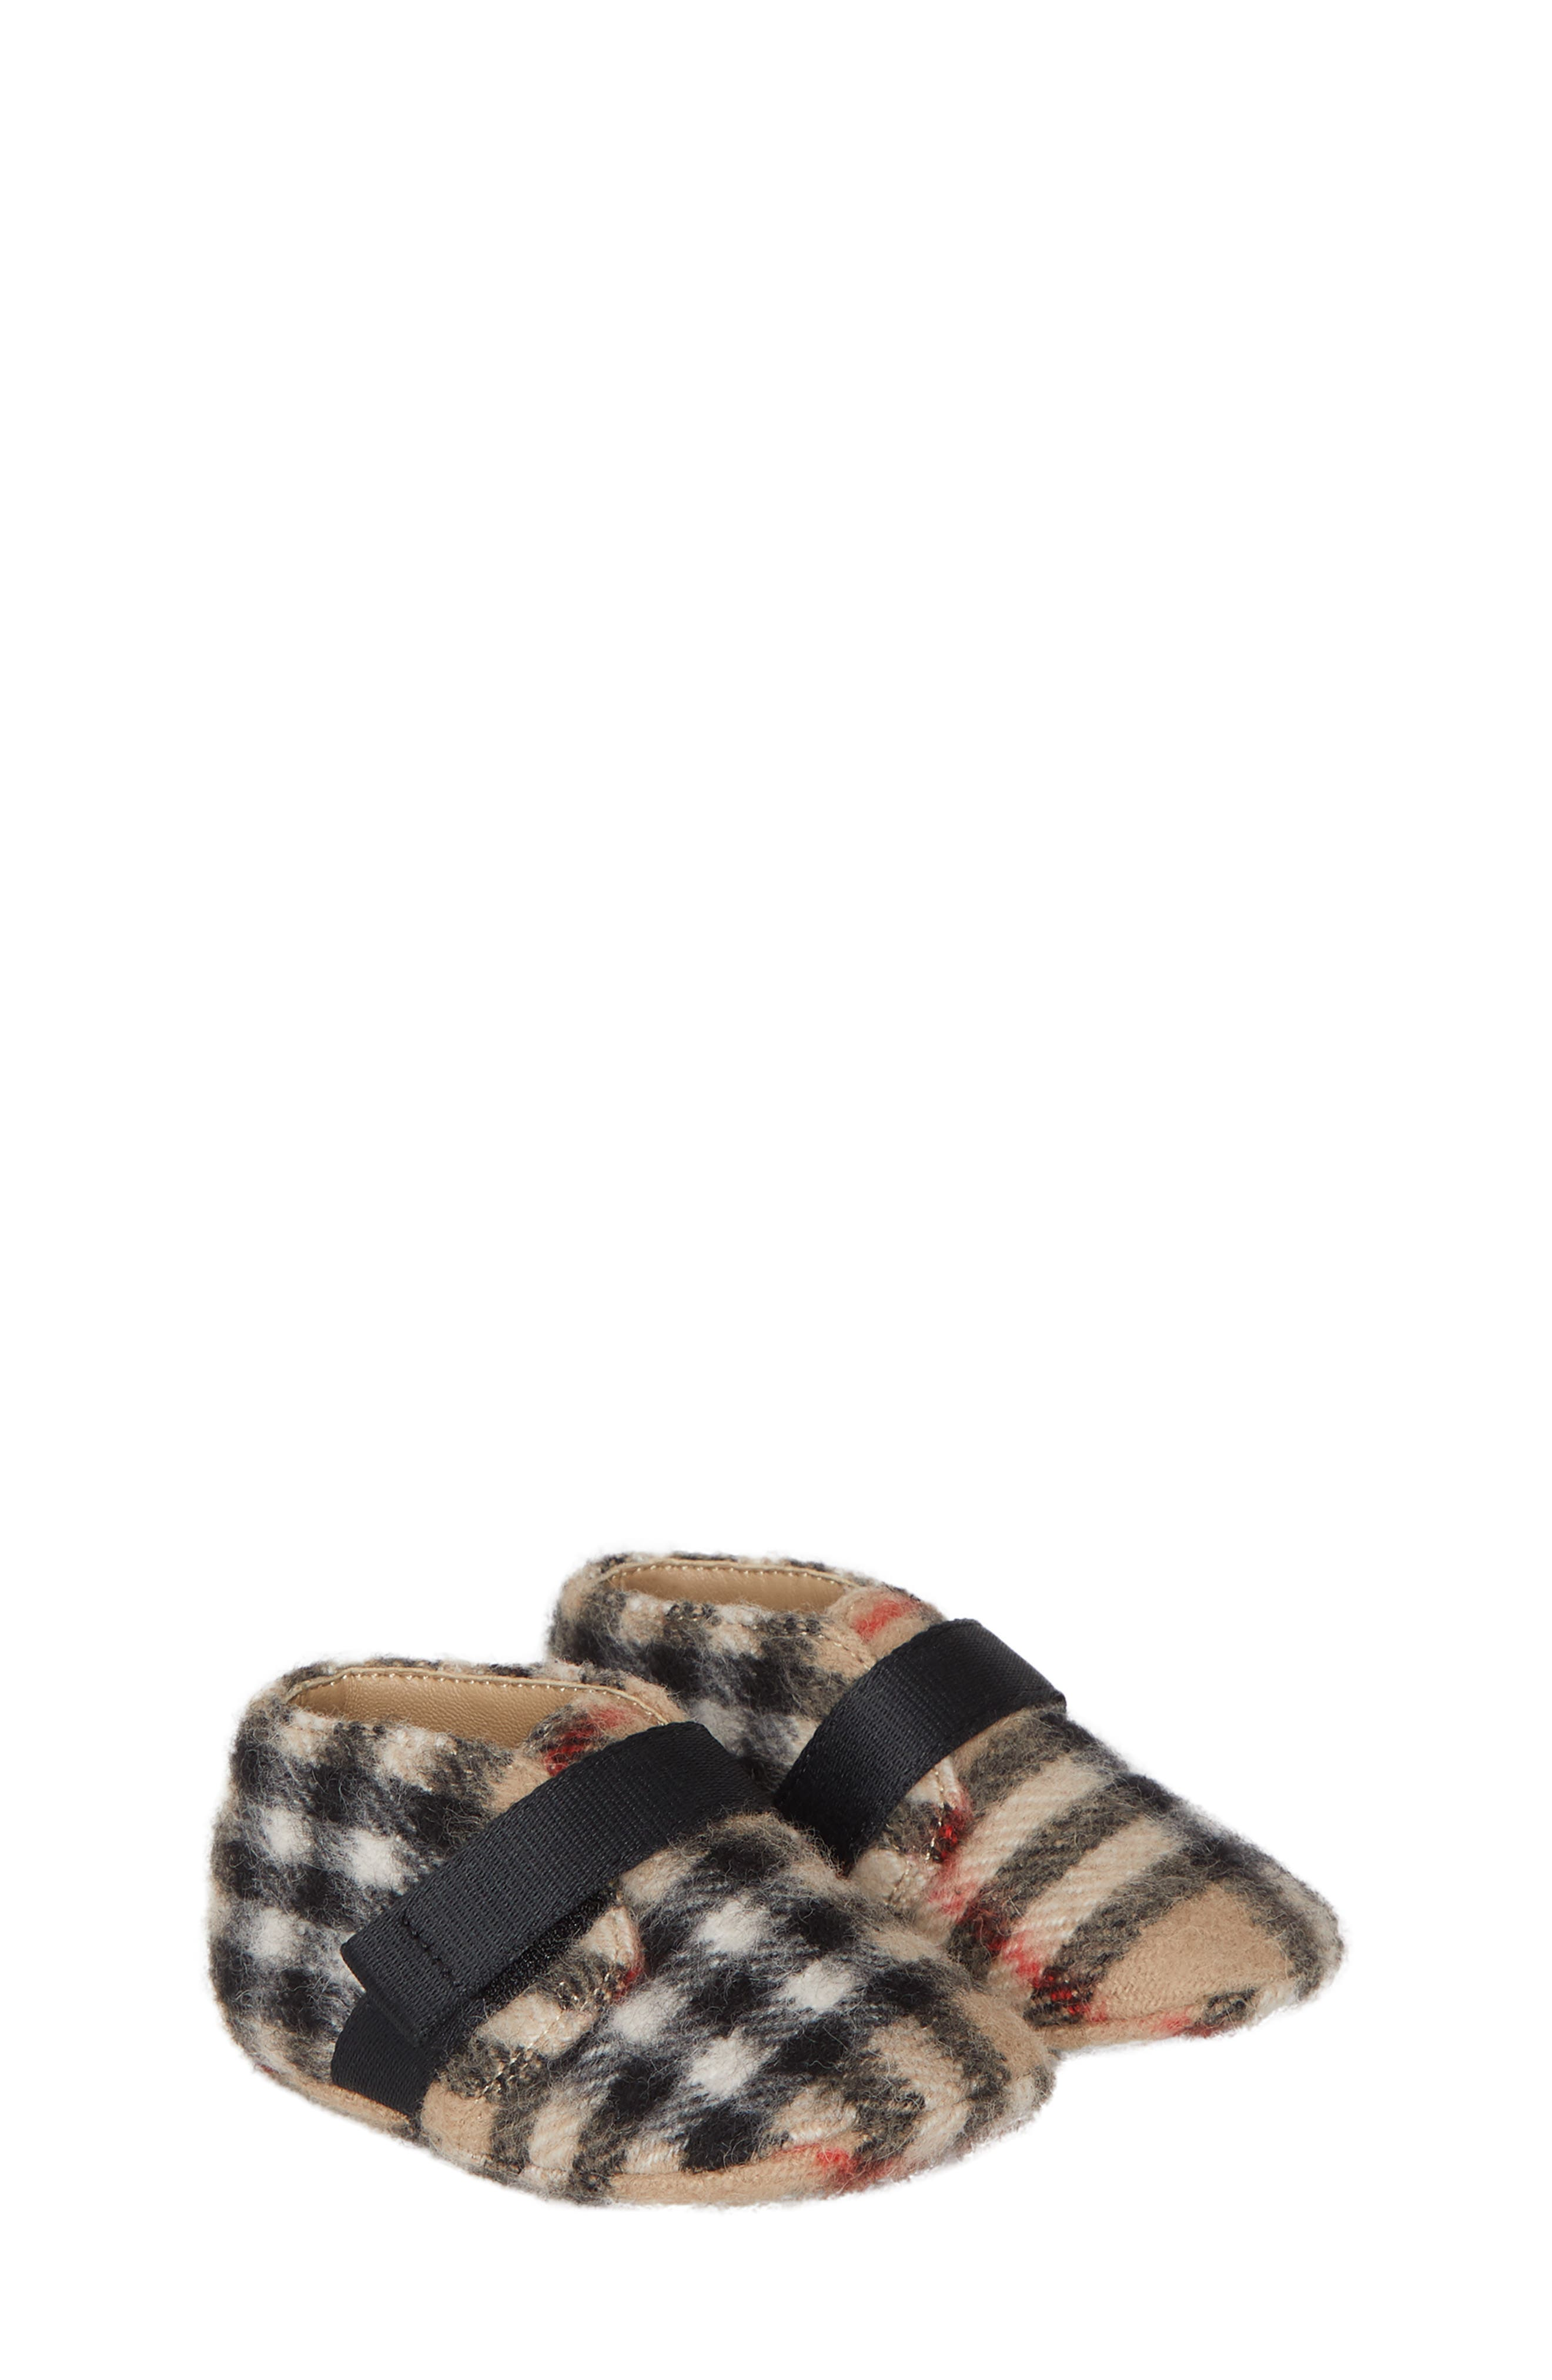 Burberry Charlton Vintage Check Wool Crib Shoe